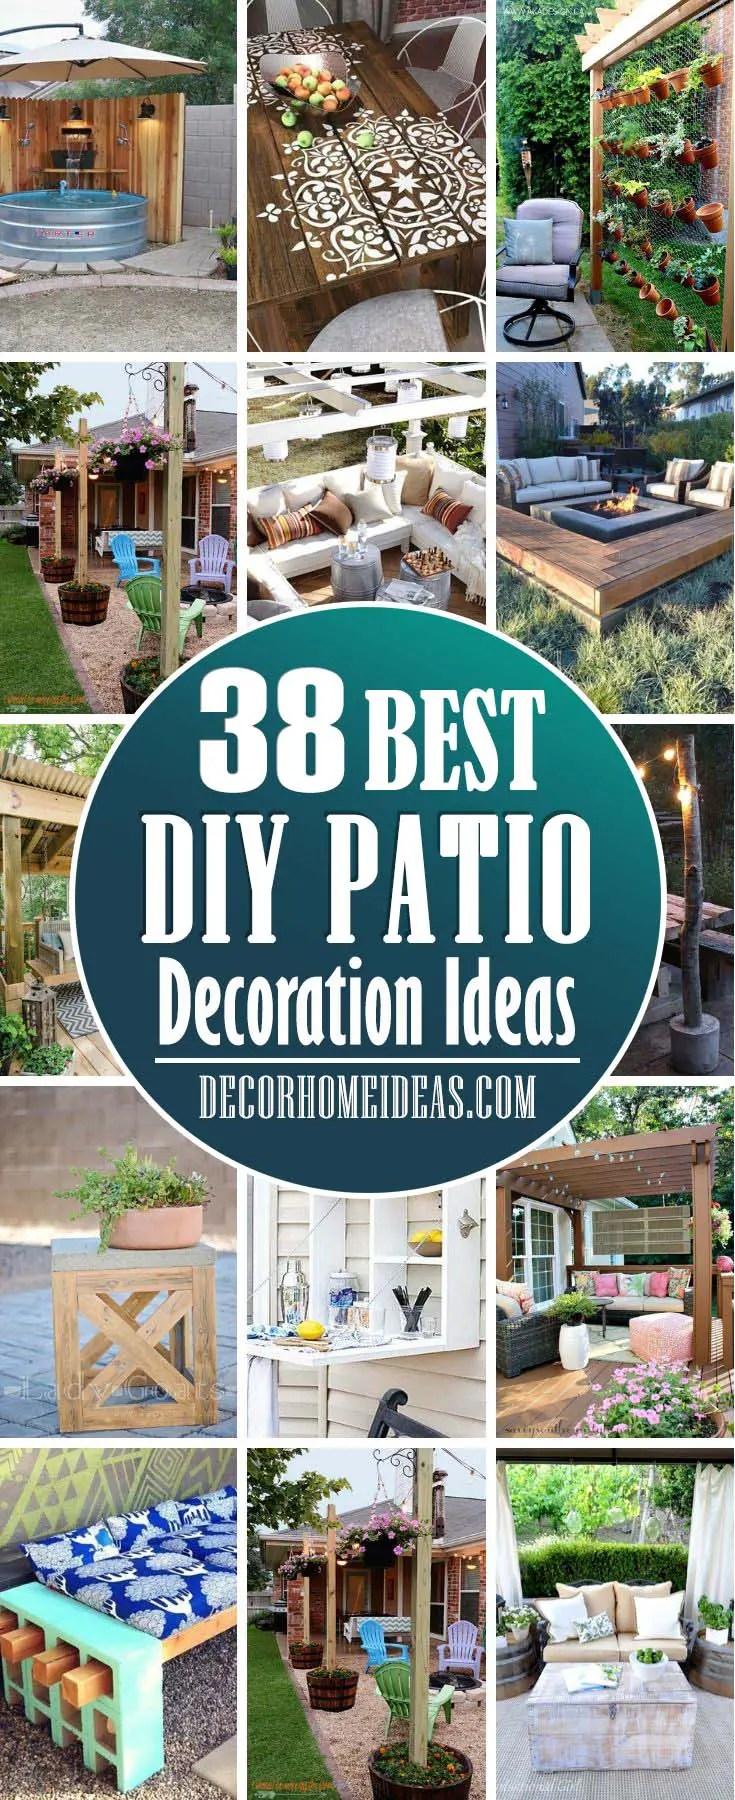 40 best diy patio decoration ideas to